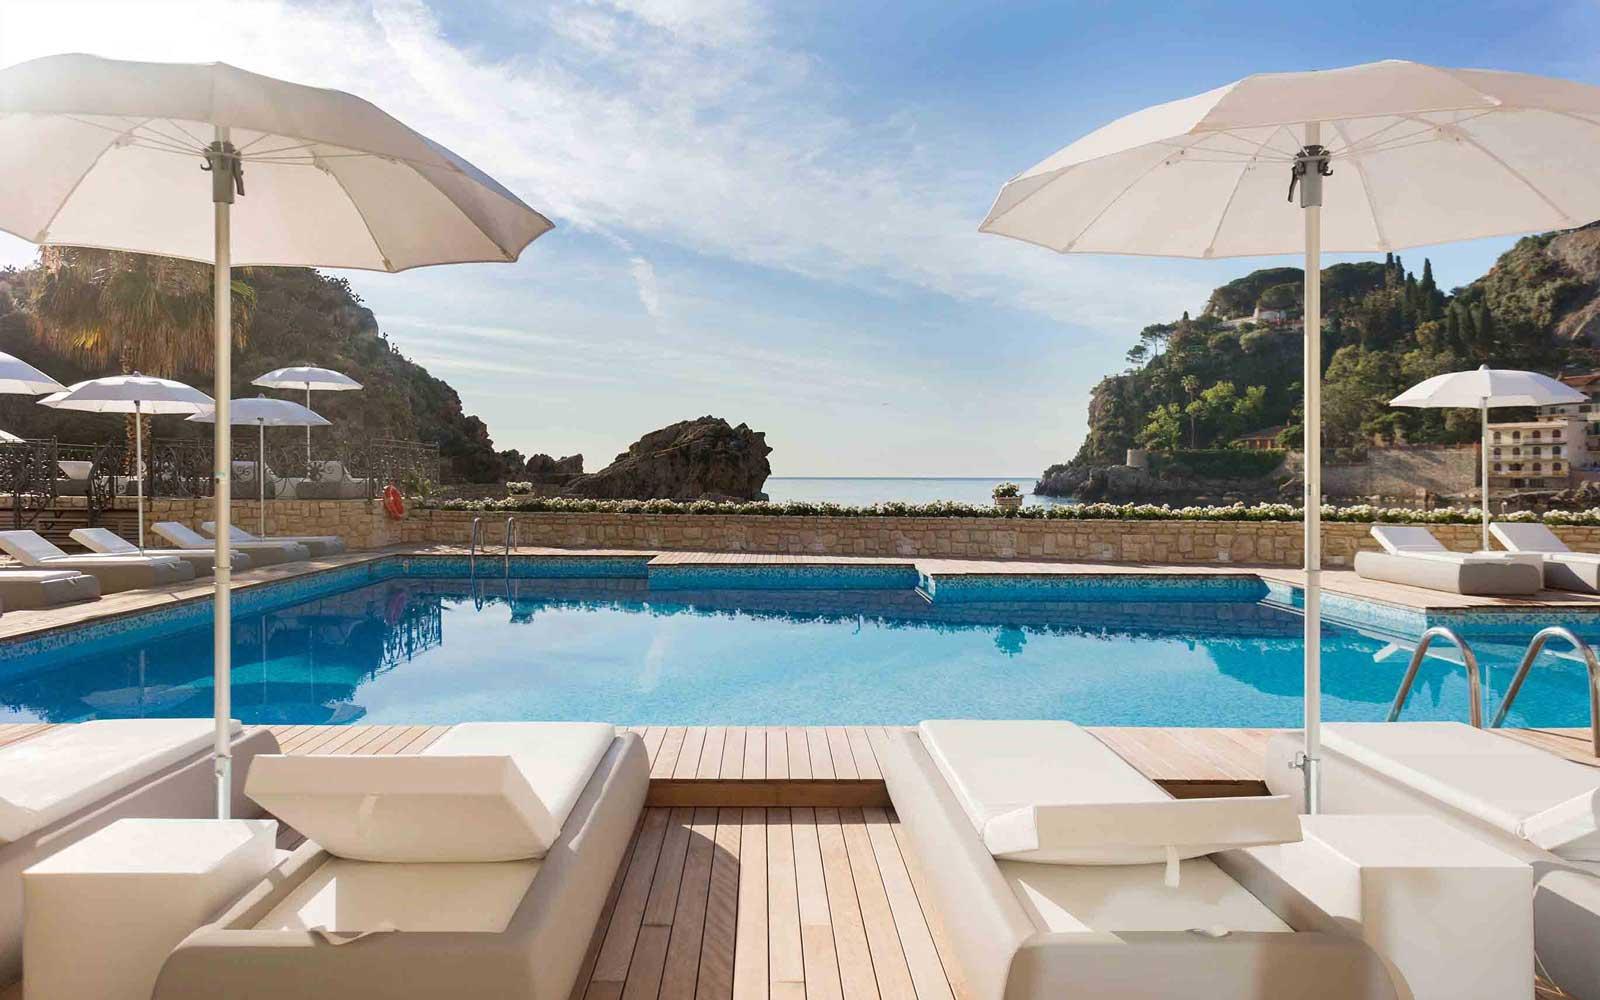 Pool at Grand Hotel Mazzaro Sea Palace